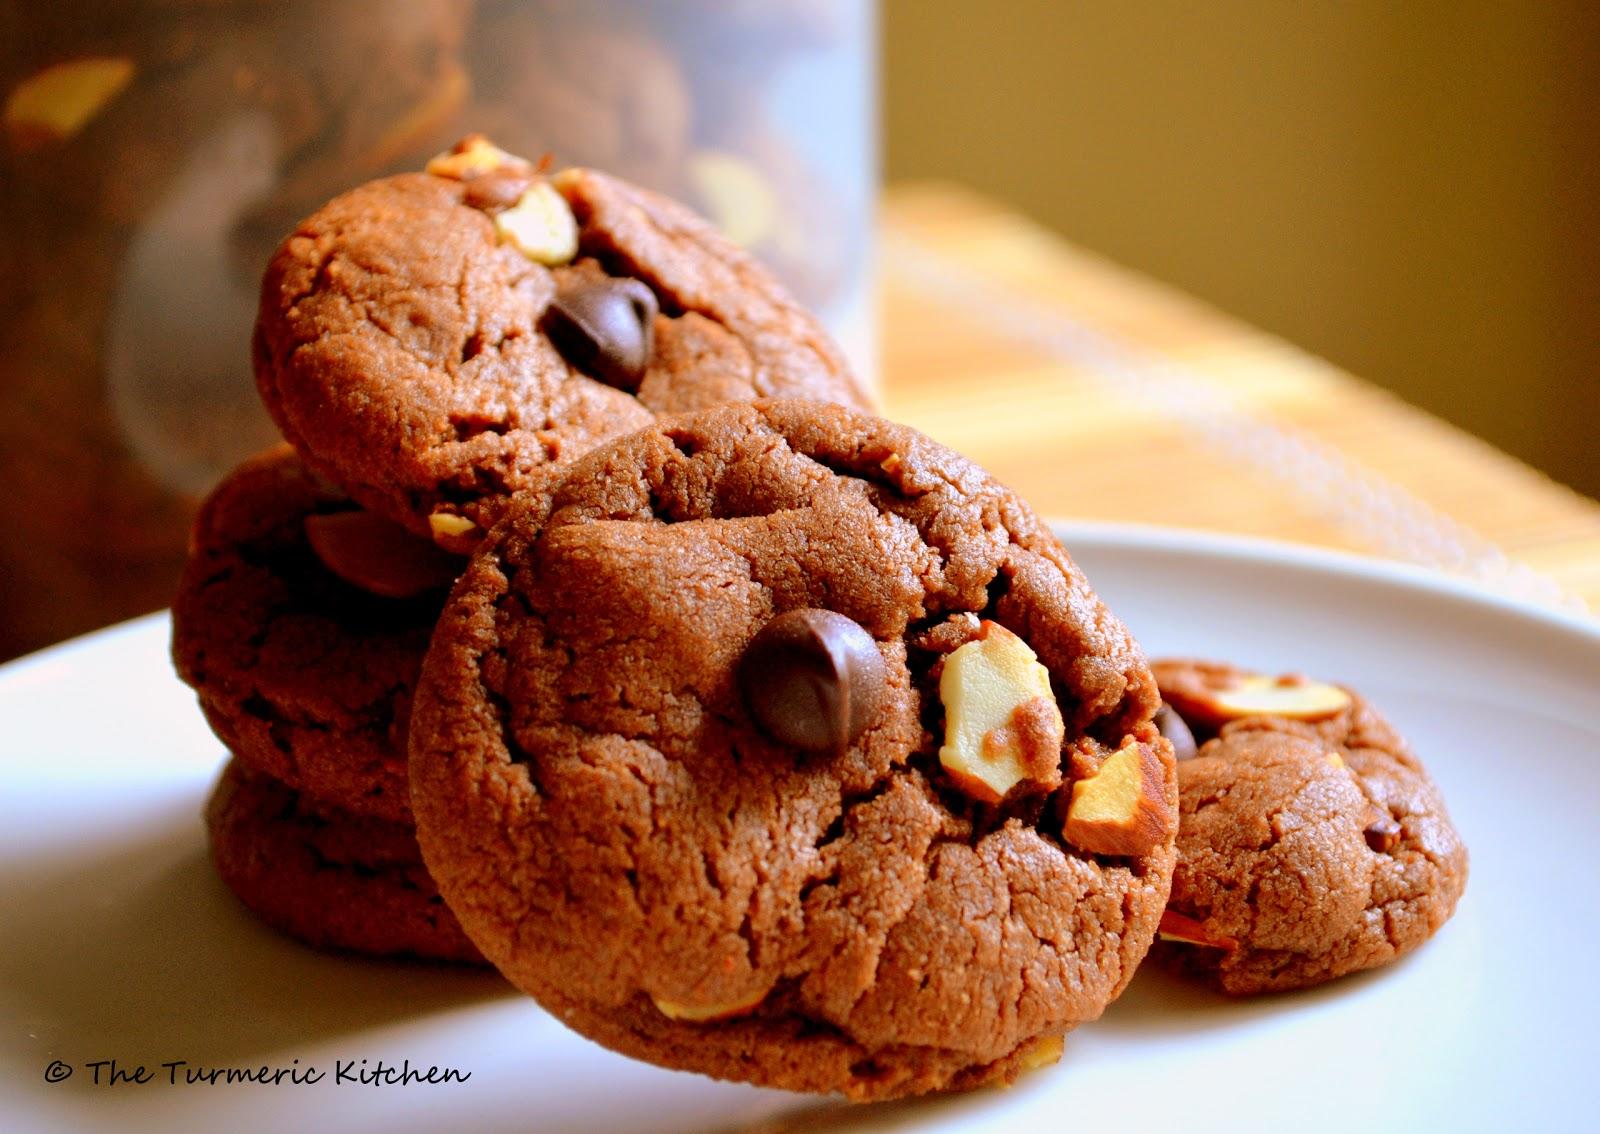 ... : The nutty-chocolaty high ~ Chocolate hazelnut & almond cookies